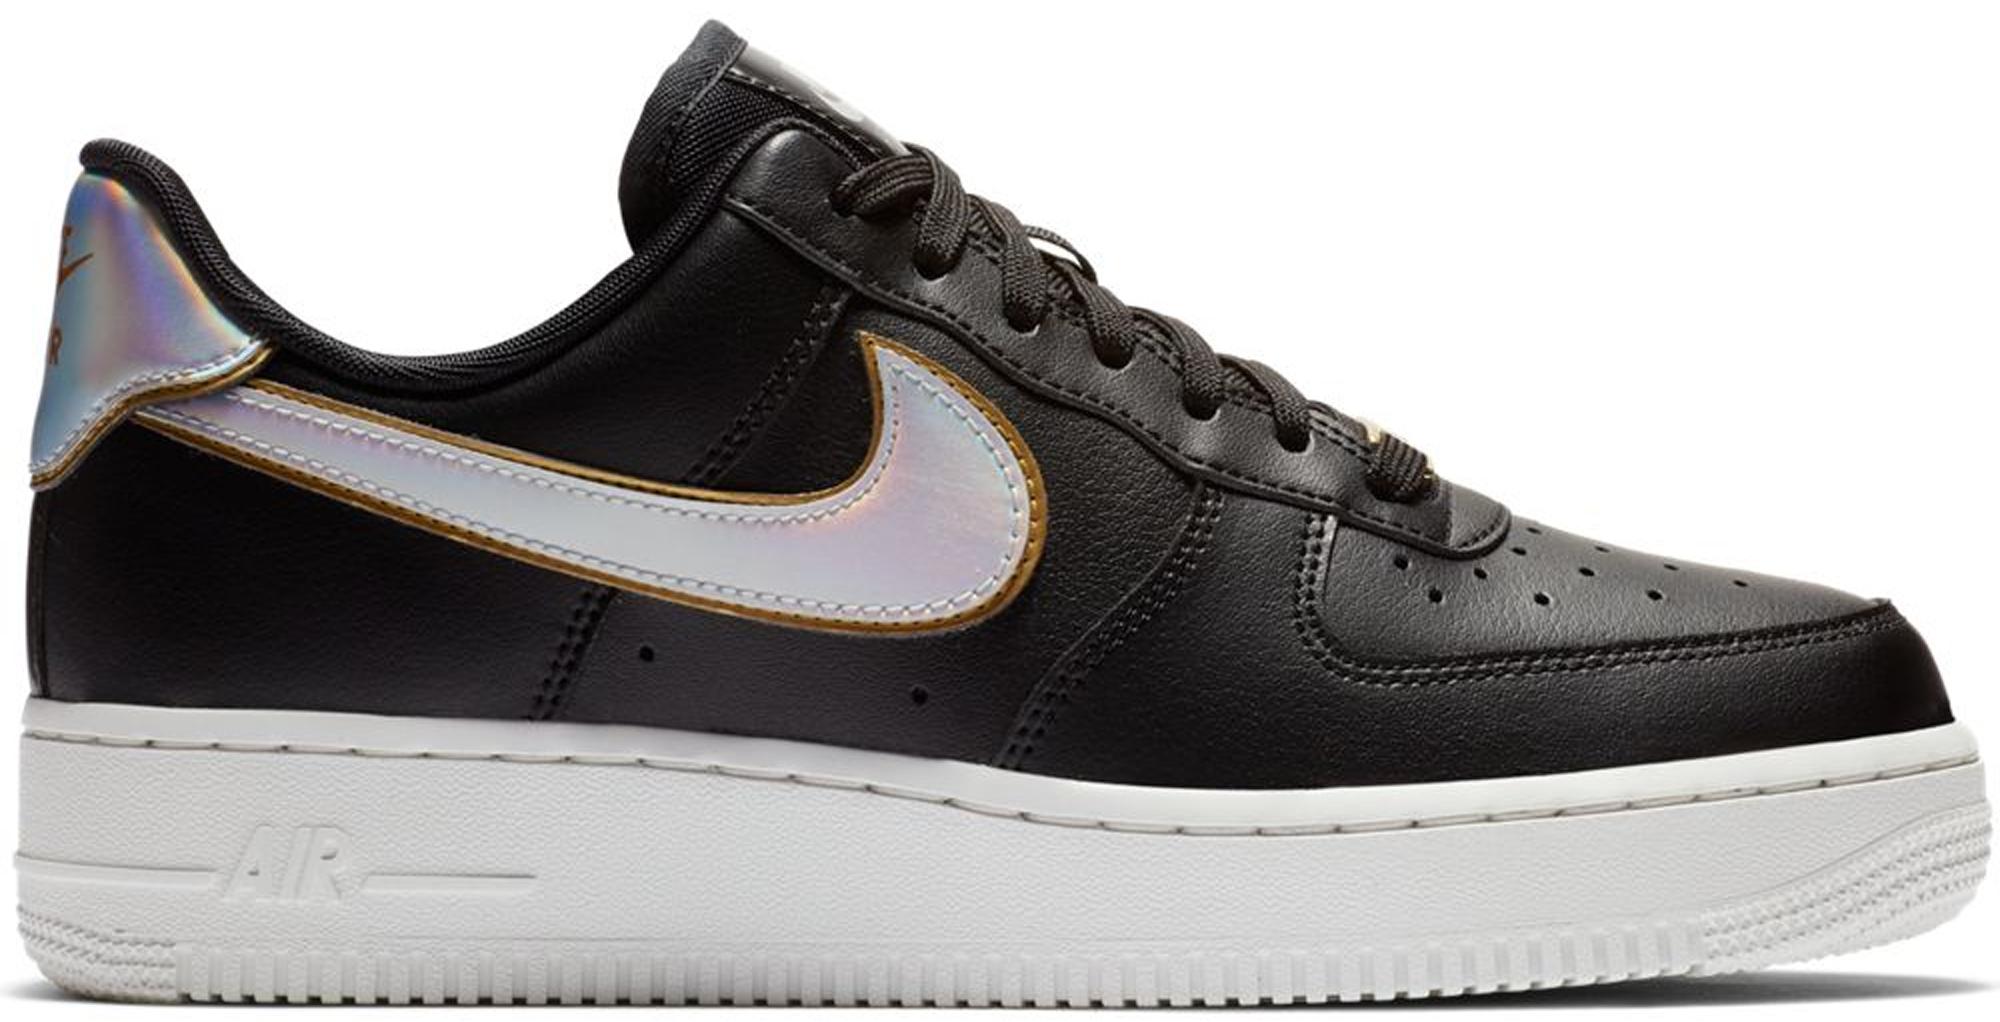 Nike Air Force 1 Low Metallic Swoosh